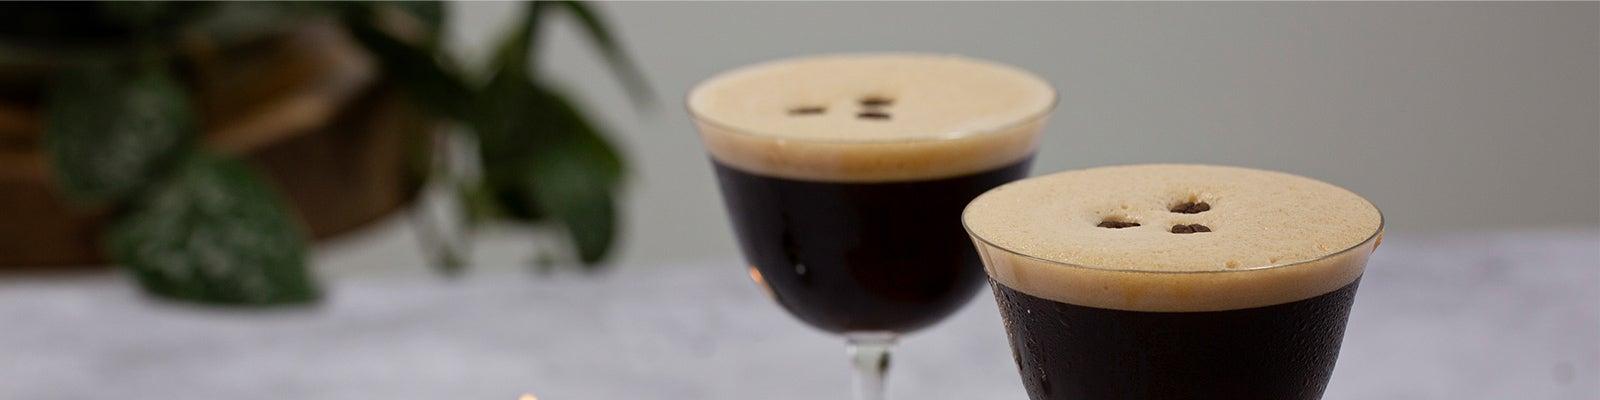 espresso-martini-recipe-header-desktop